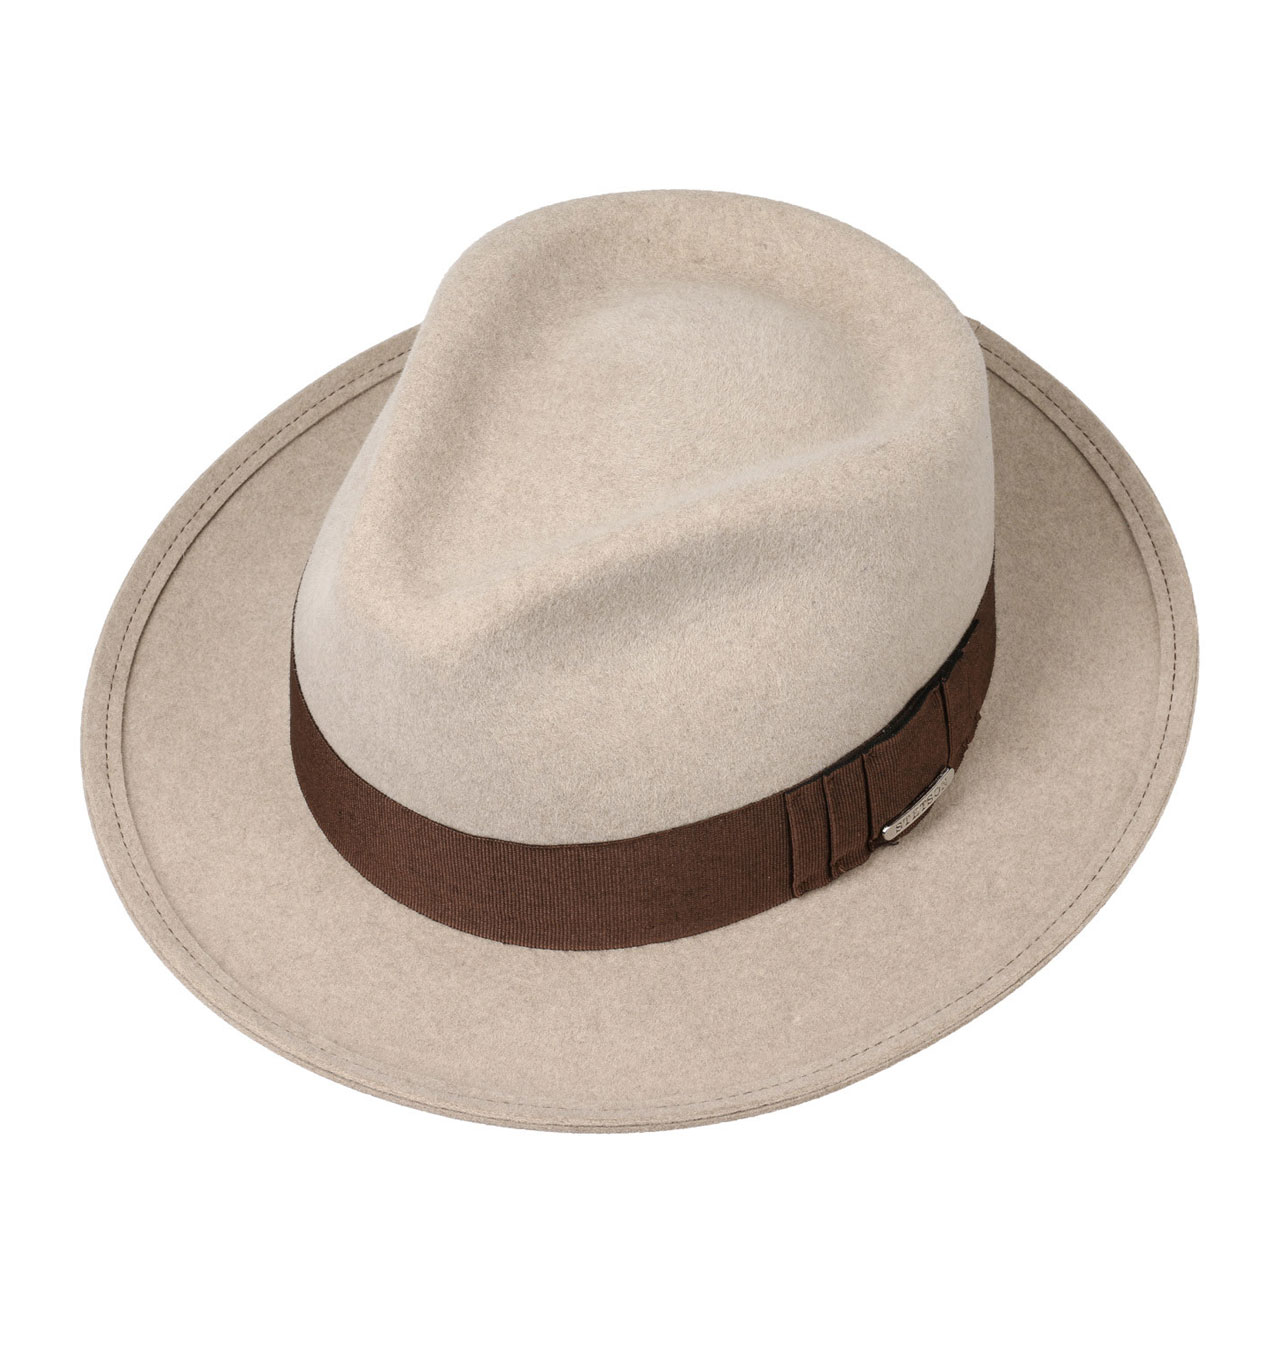 4de807055f074 Stetson - New Orleans Fur Felt Fedora Hat - Oatmeal